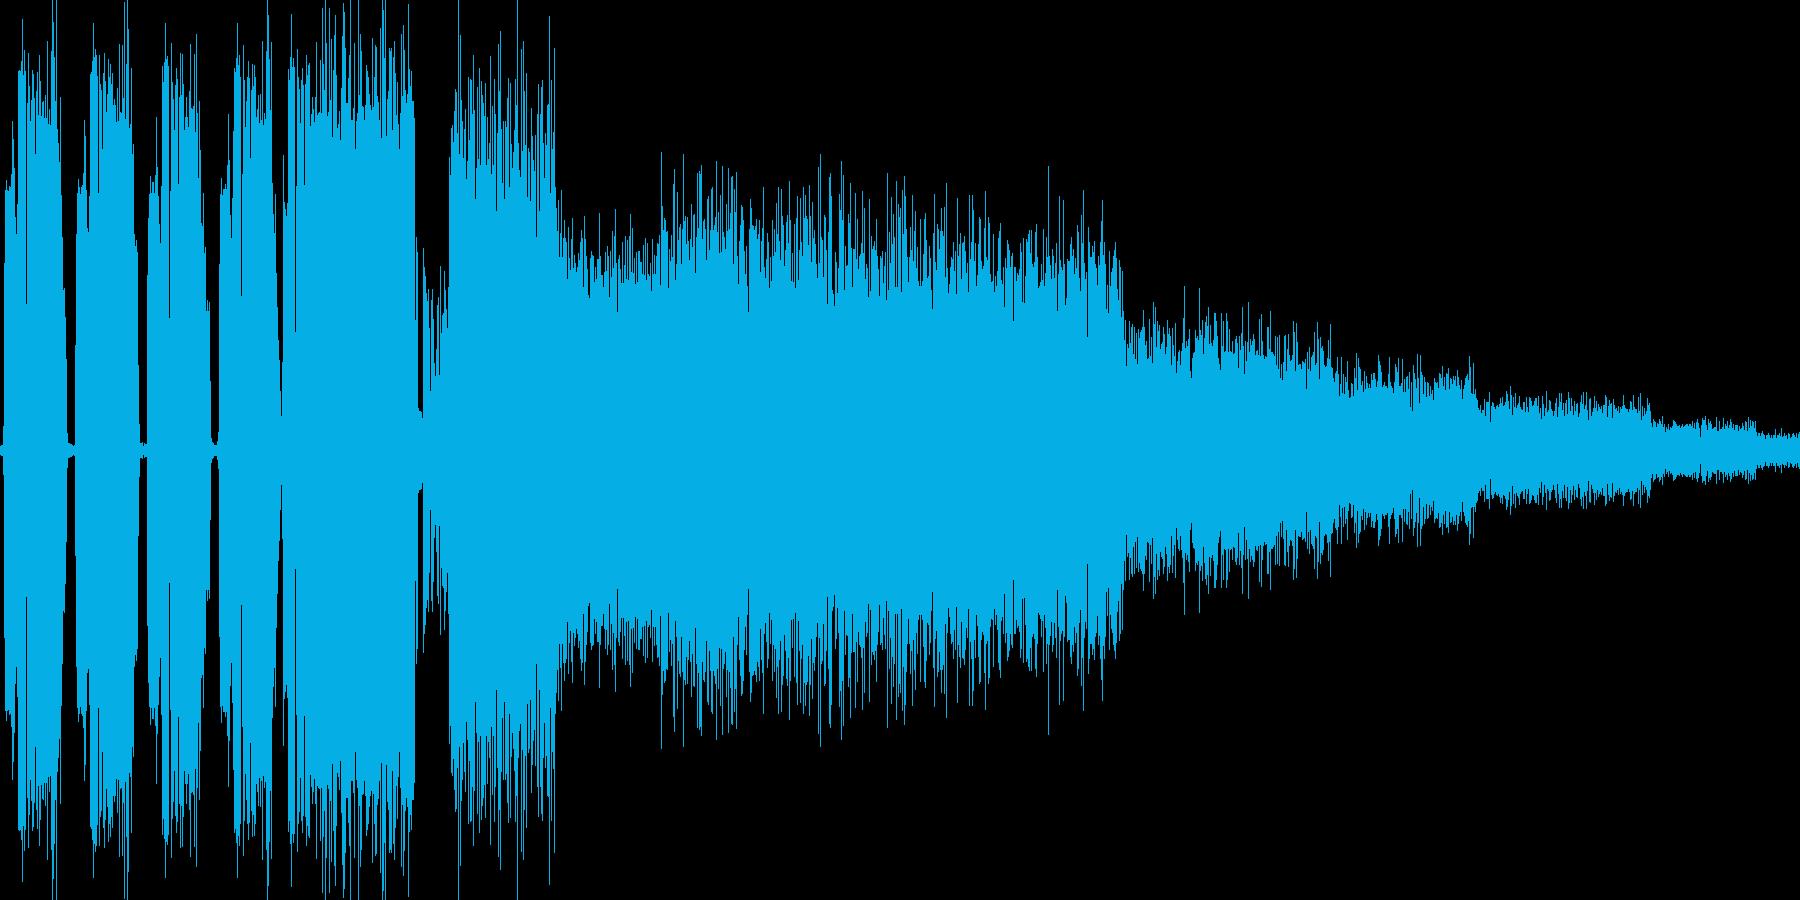 RPG:雷魔法音「ババババシャーン」の再生済みの波形